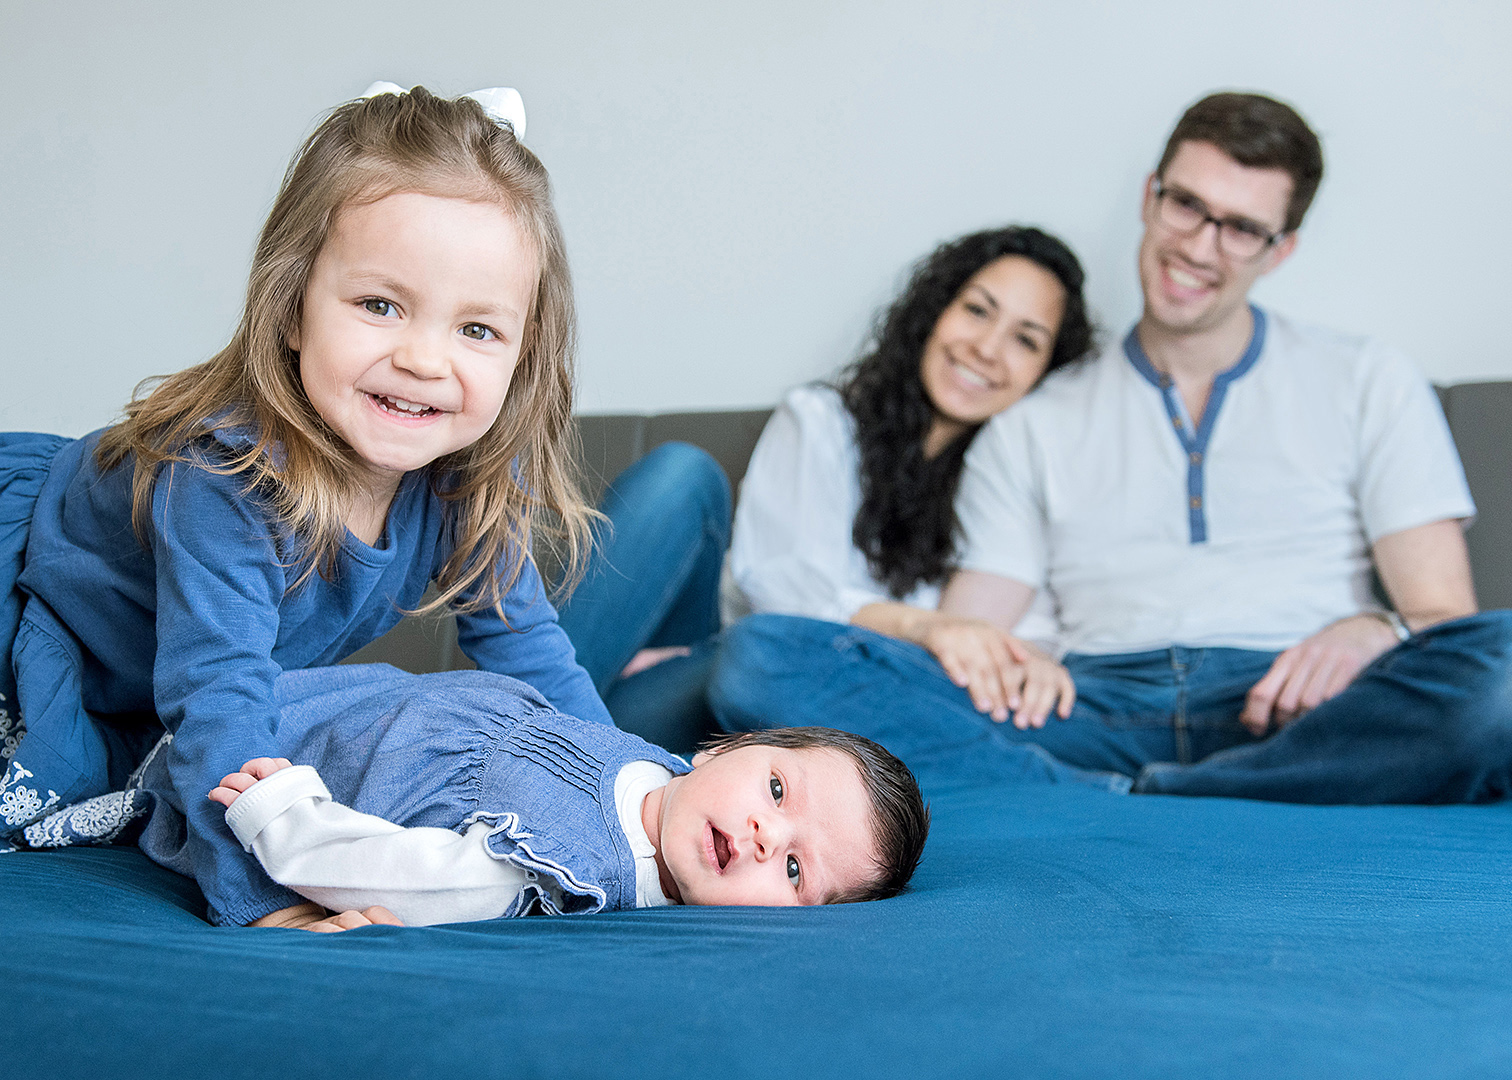 Babybauch Fotoshooting mit Geschwisterkindern, Schwangerschaftsfotos zuhause, mobiles Fotostudio Berlin, schwangerenfotografie berlin, babybauch fotoshooting, schwanger, fotoshooting berlin, fotograf berlin, familienfotos berlin